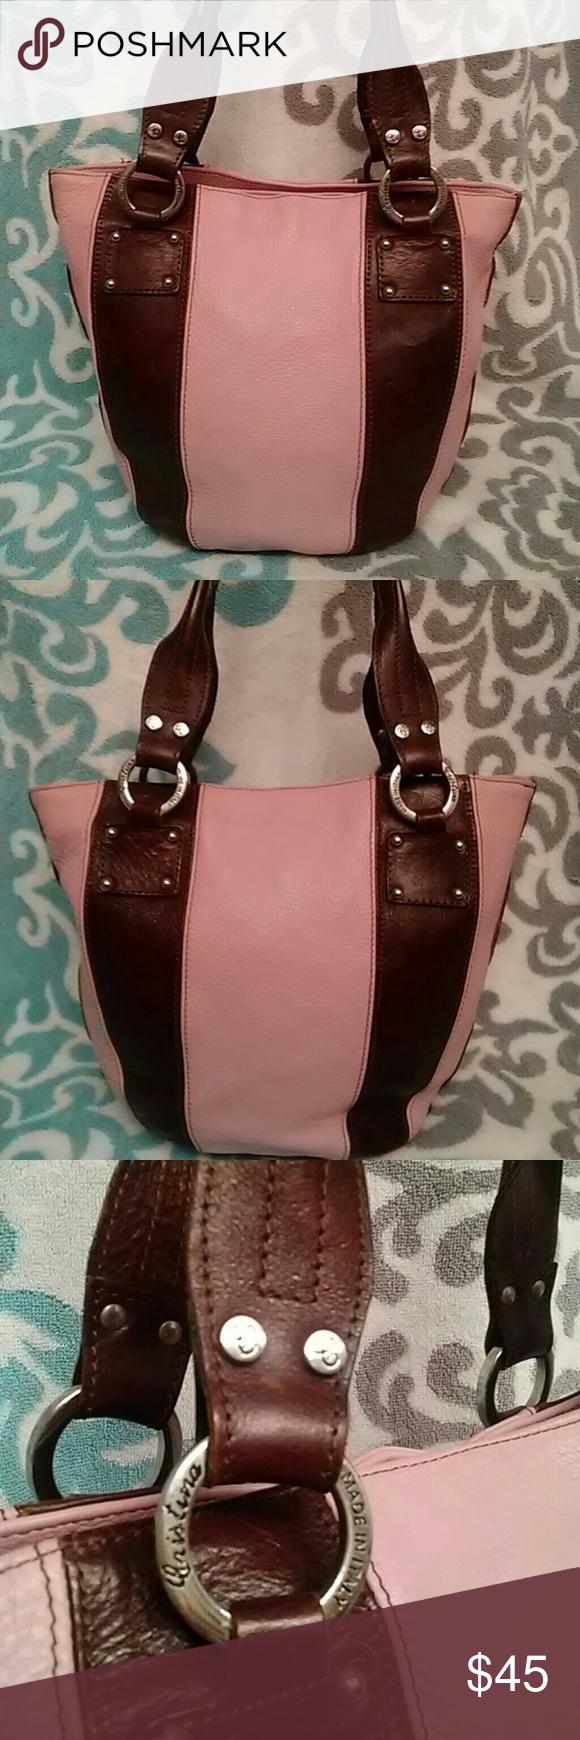 Cristina Italian Leather Bucket Bag Made In Italy Authentic Vintage Handbag Beautiful Fully Lined On Medium Size